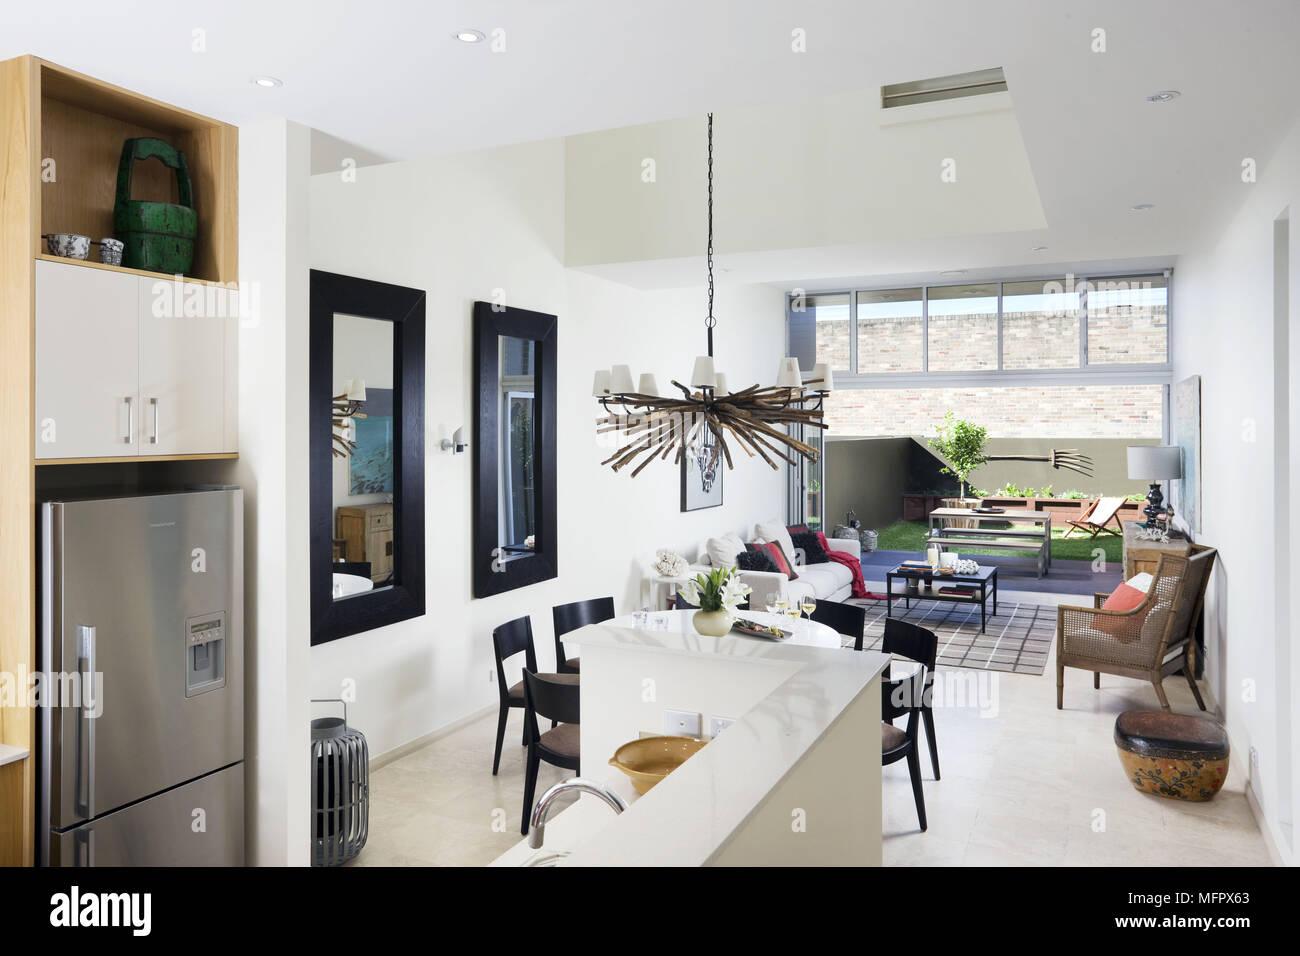 Modern open plan room con cucina sala da pranzo e le aree salotto e ...